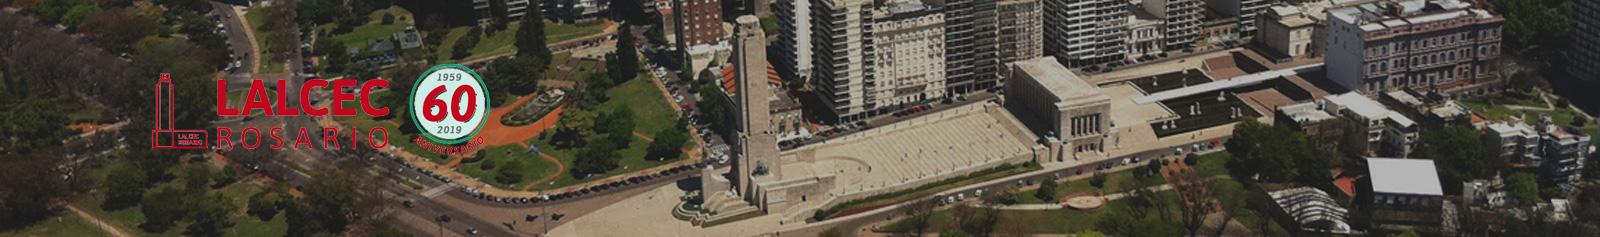 LALCEC Rosario